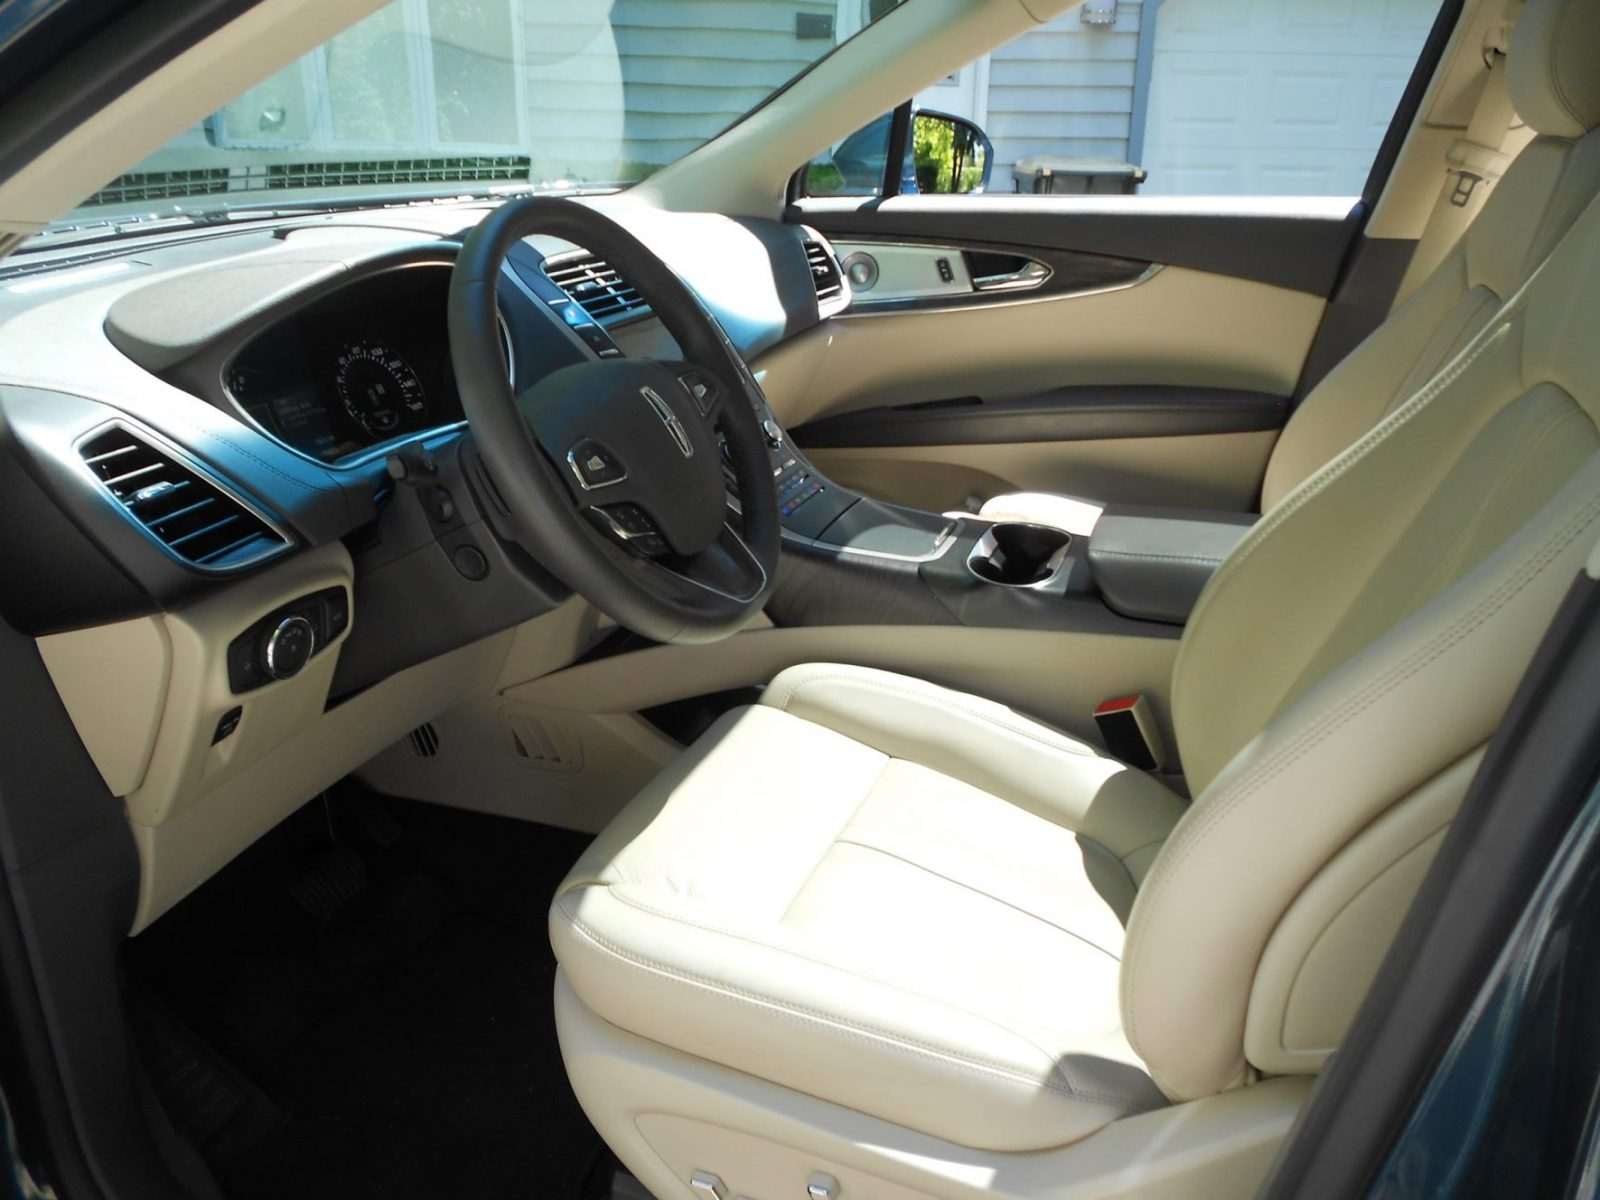 2016 Lincoln Mkx Interior Ken Glassman 6